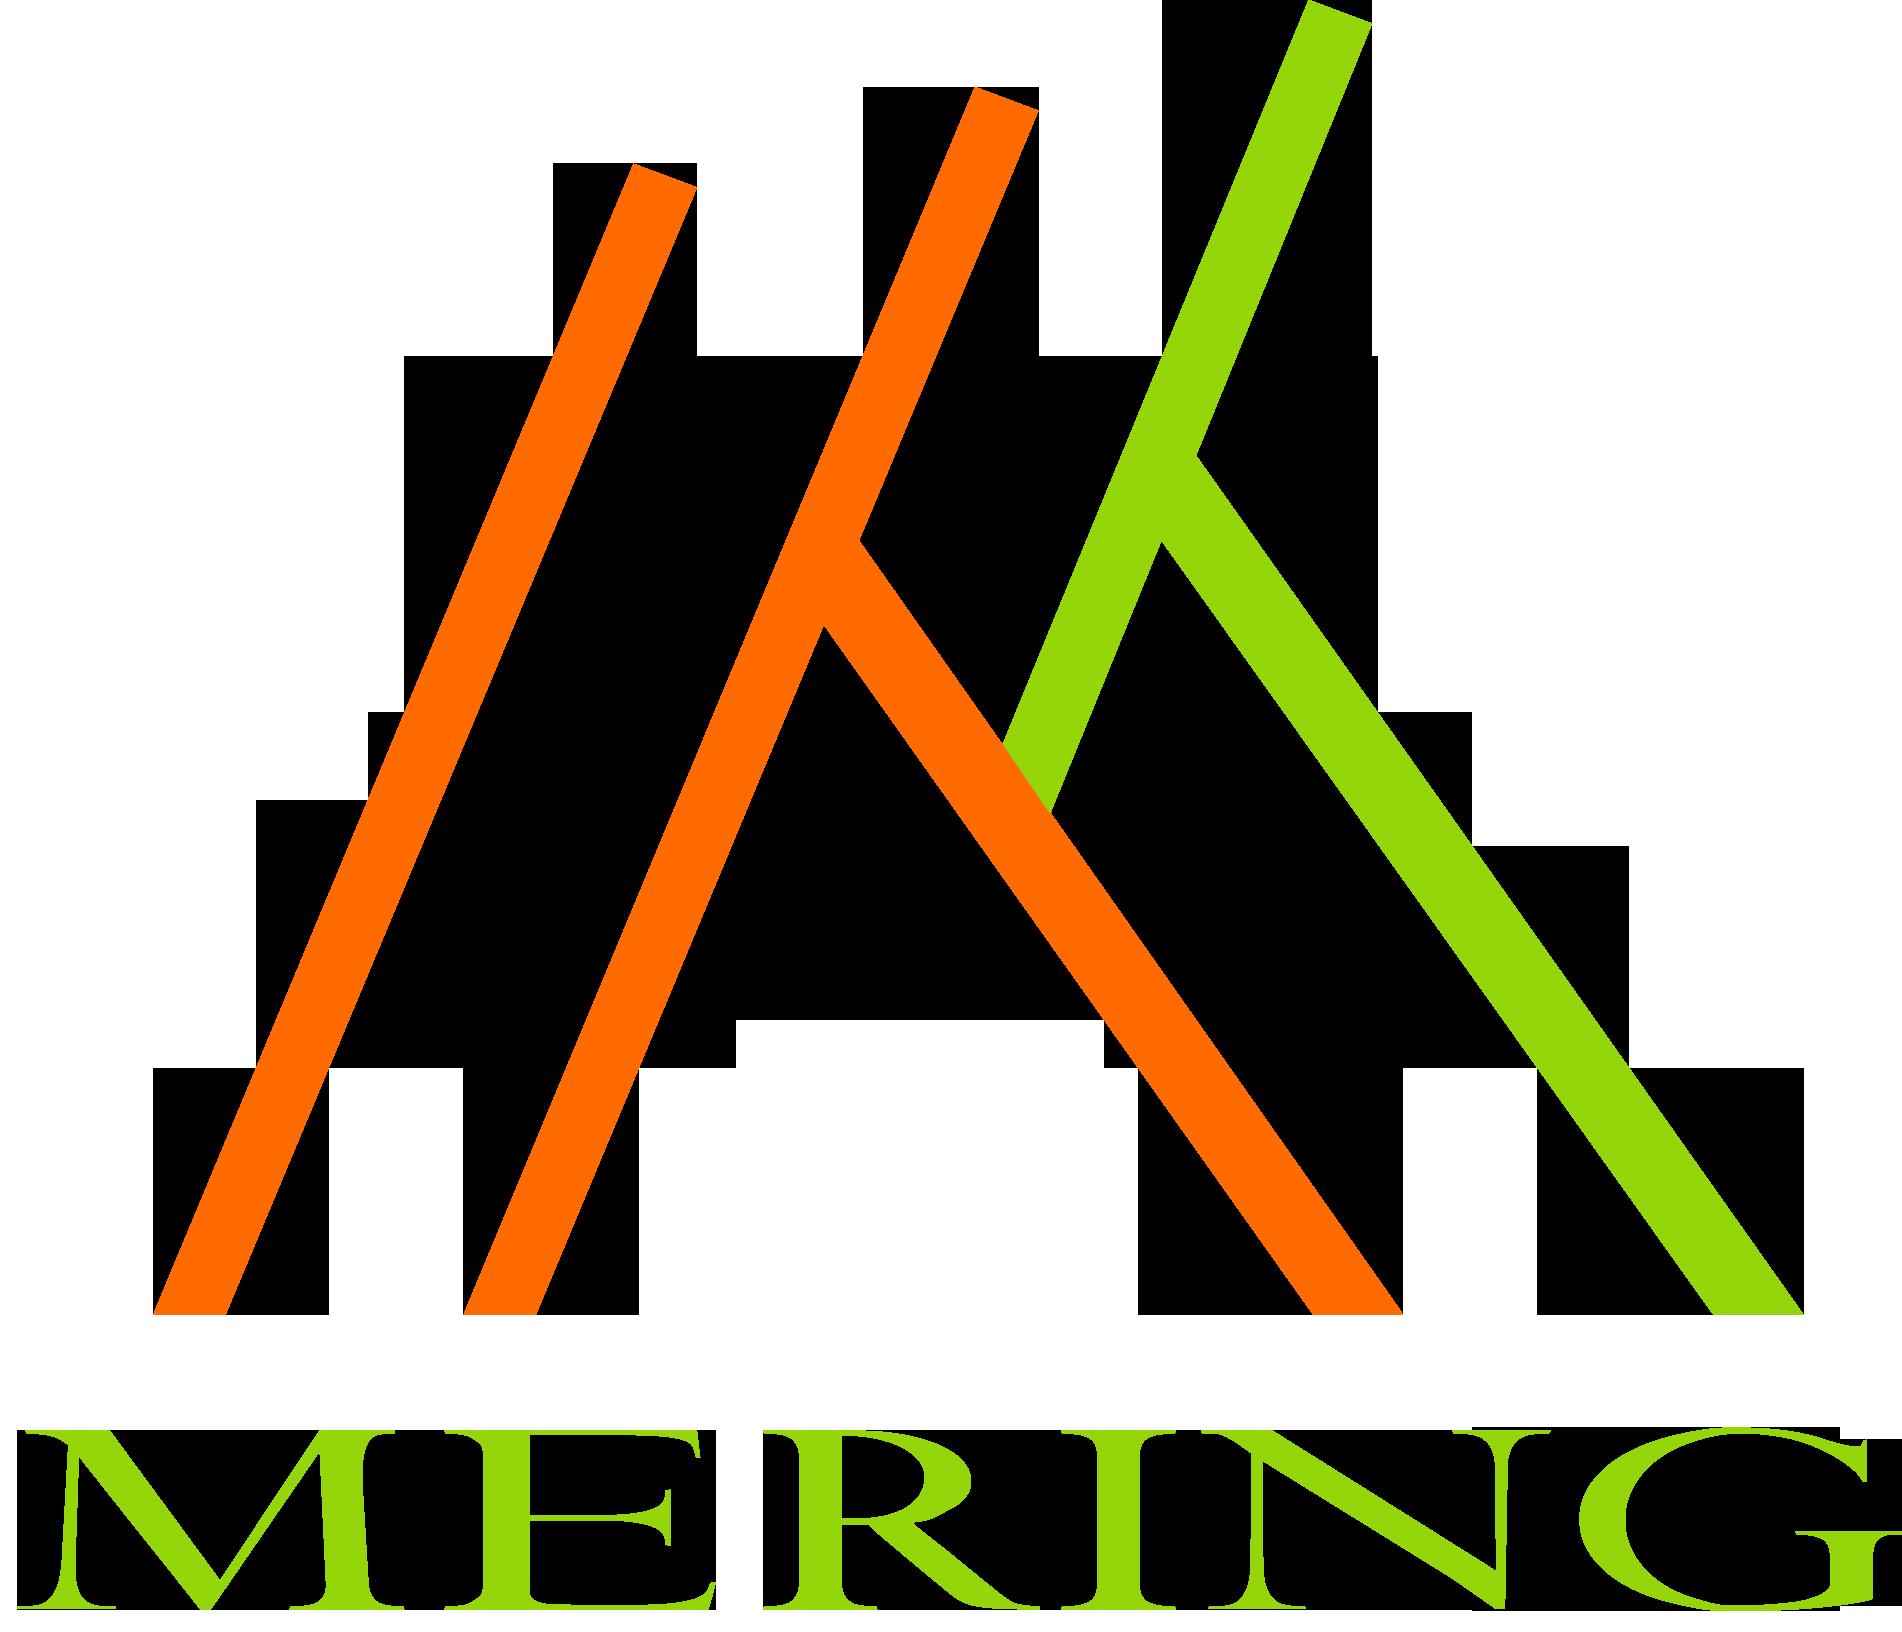 Mering